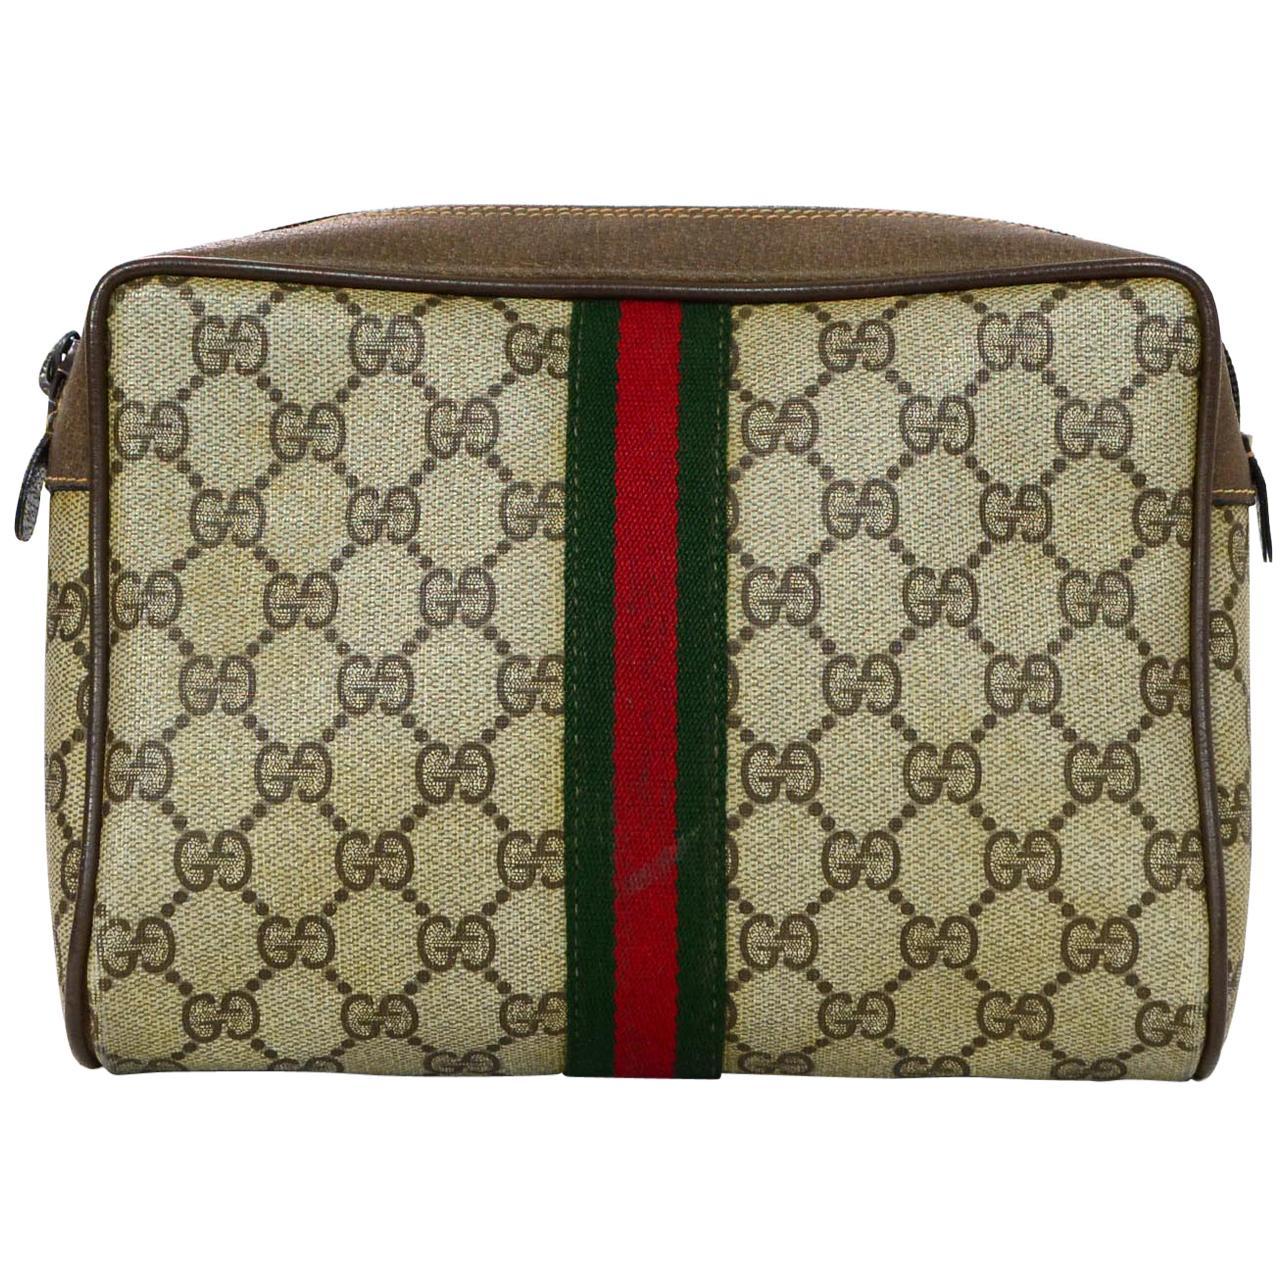 6377d866779 Gucci monogram supreme canvas clutch bag cosmetic case red green jpg  768x768 Vtg gg monogram